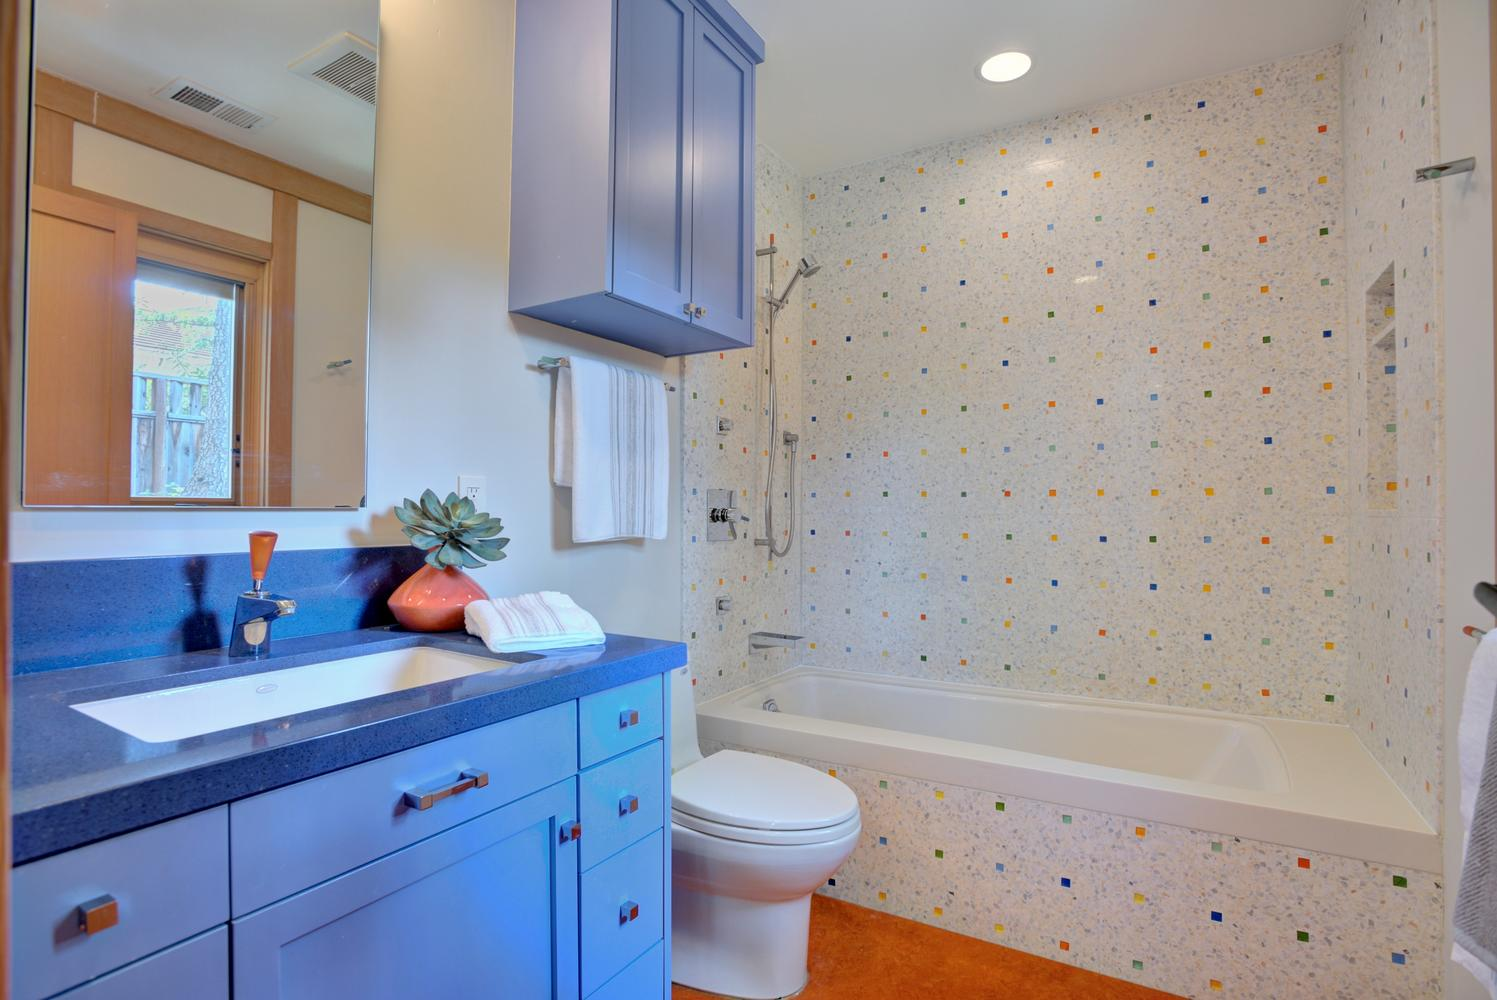 573 More Ave Los Gatos CA-large-028-2-Bedroom Three Bathroom-1498x1000-72dpi.jpg